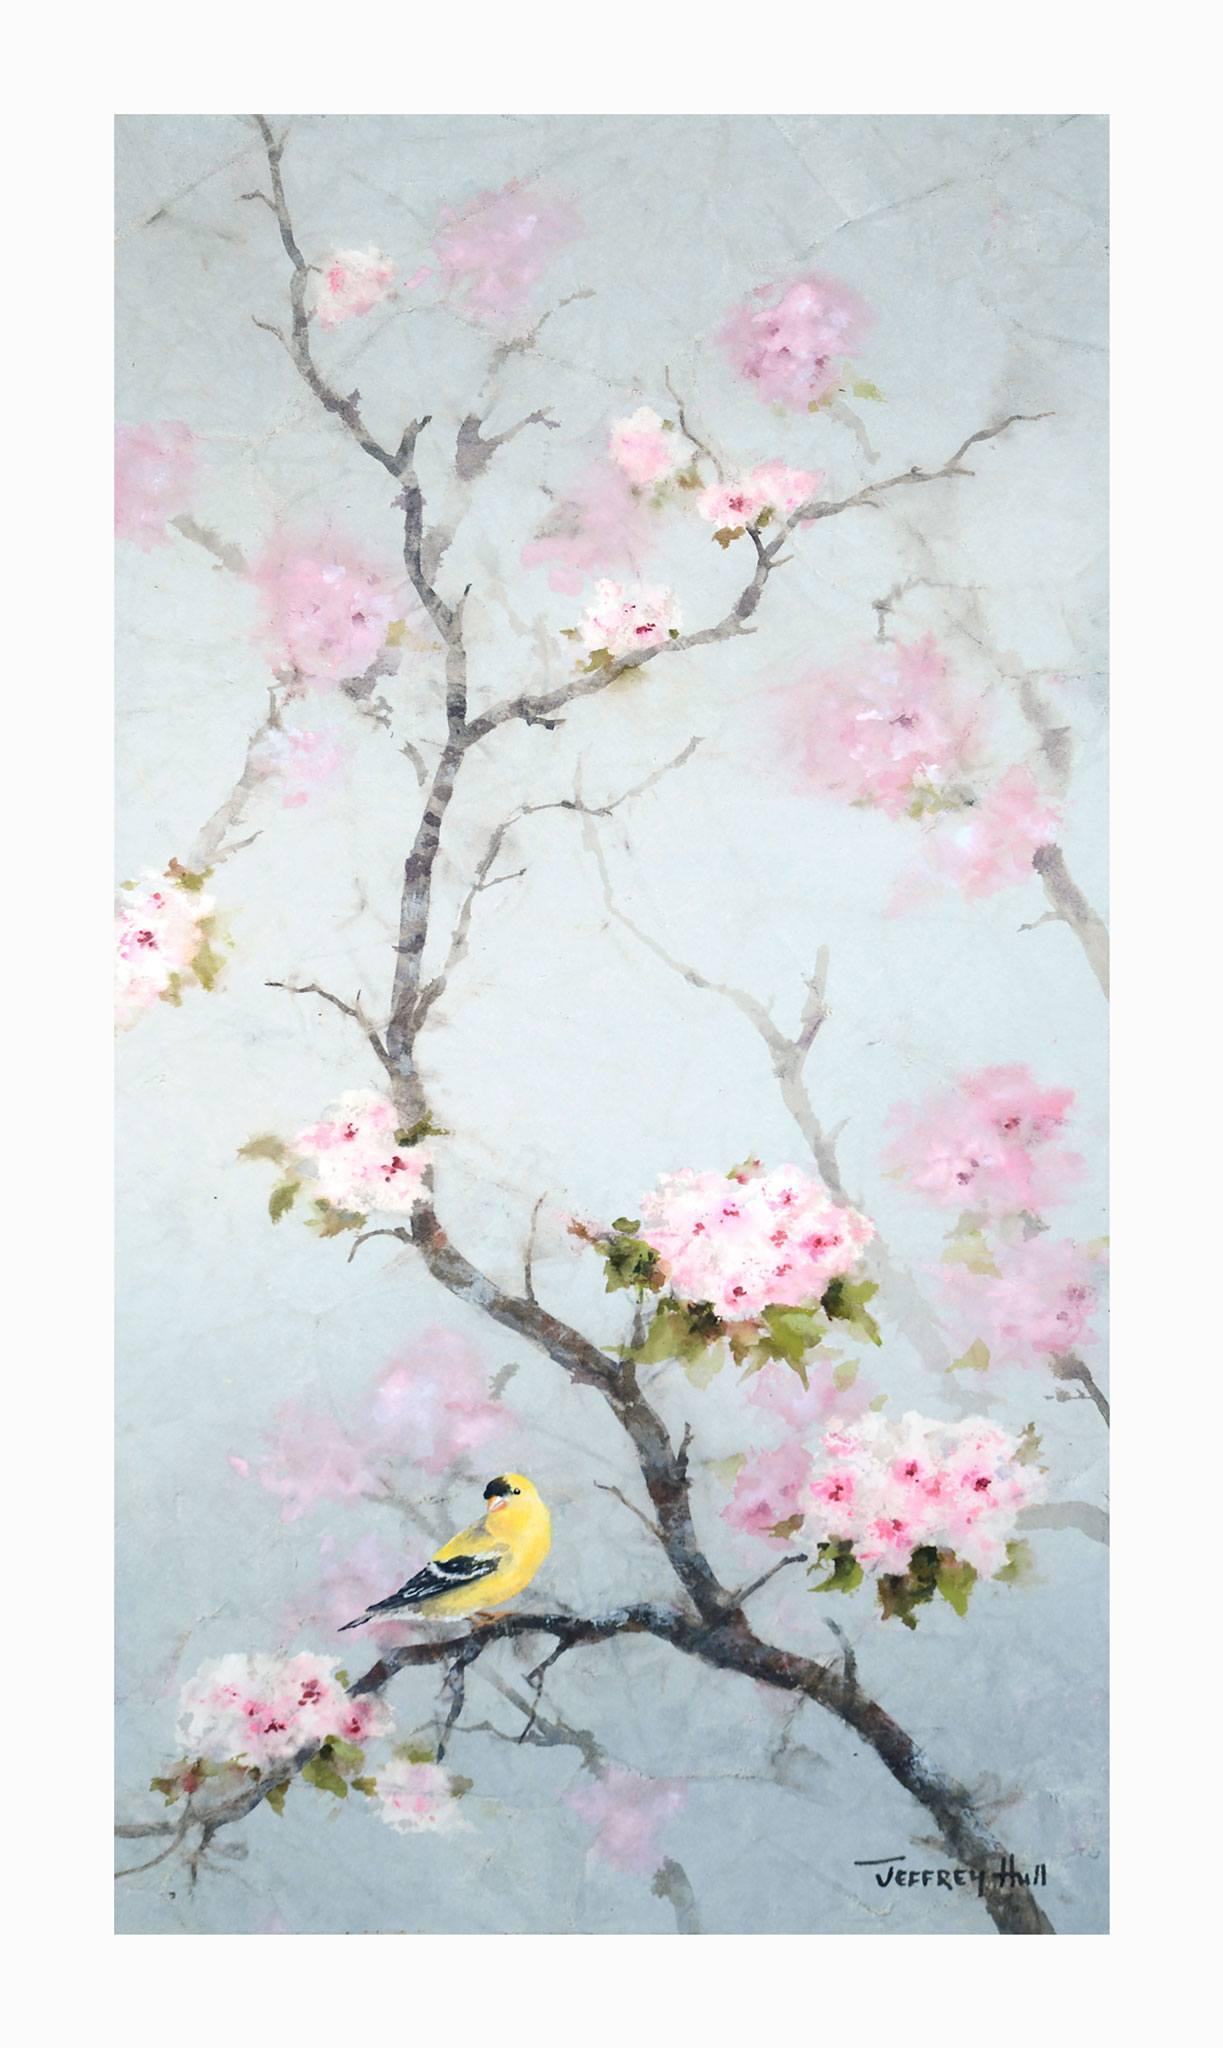 Goldfinch-_-Cherry-Blossoms-OpenEd-Unframed-4-Website-2021